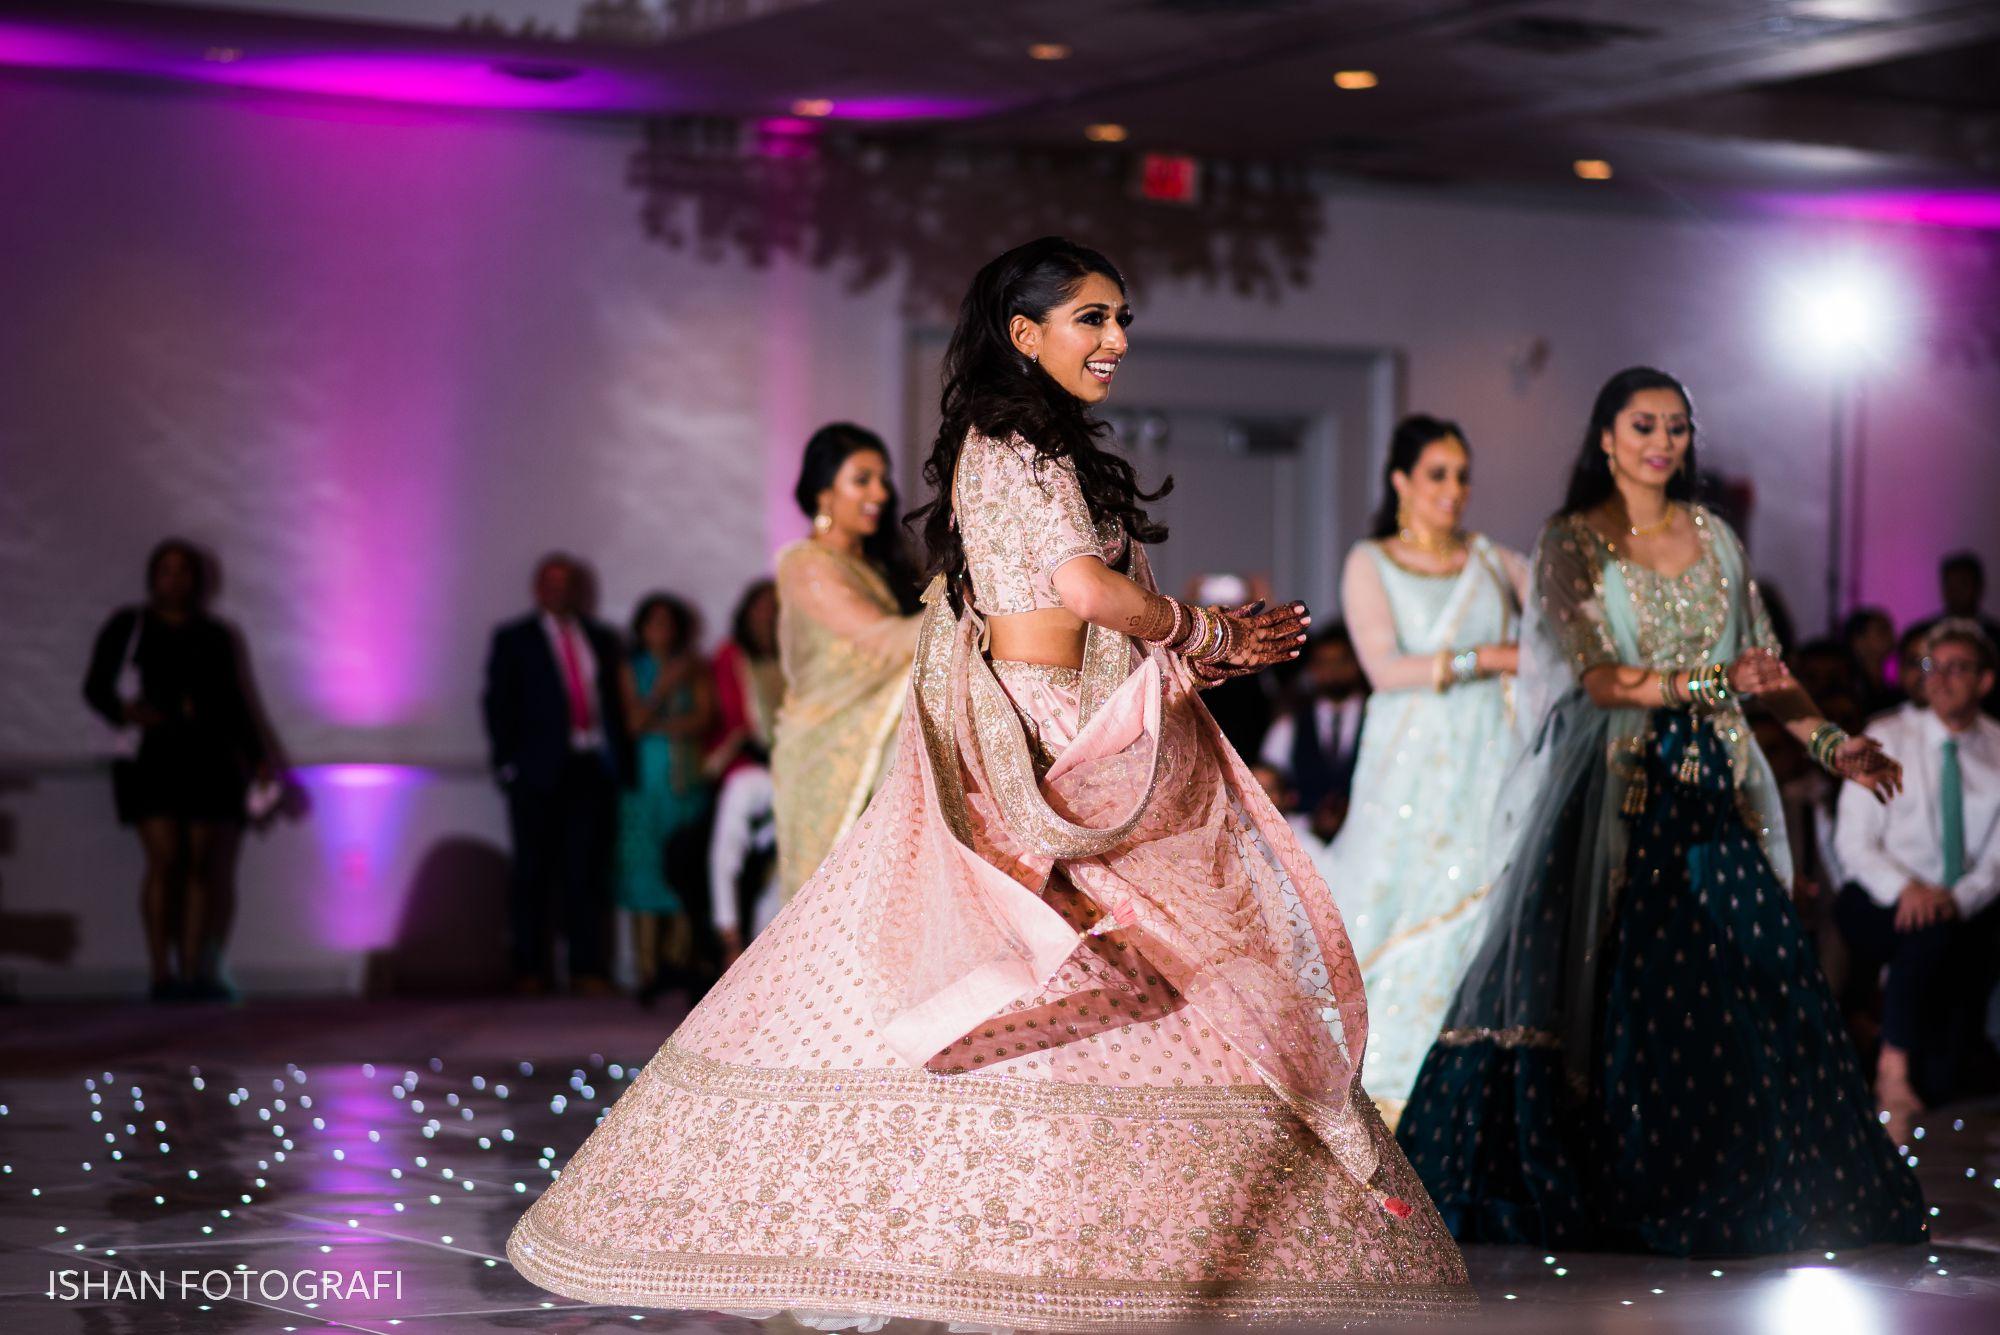 bride-wedding-reception-at-sheraton-parsippany